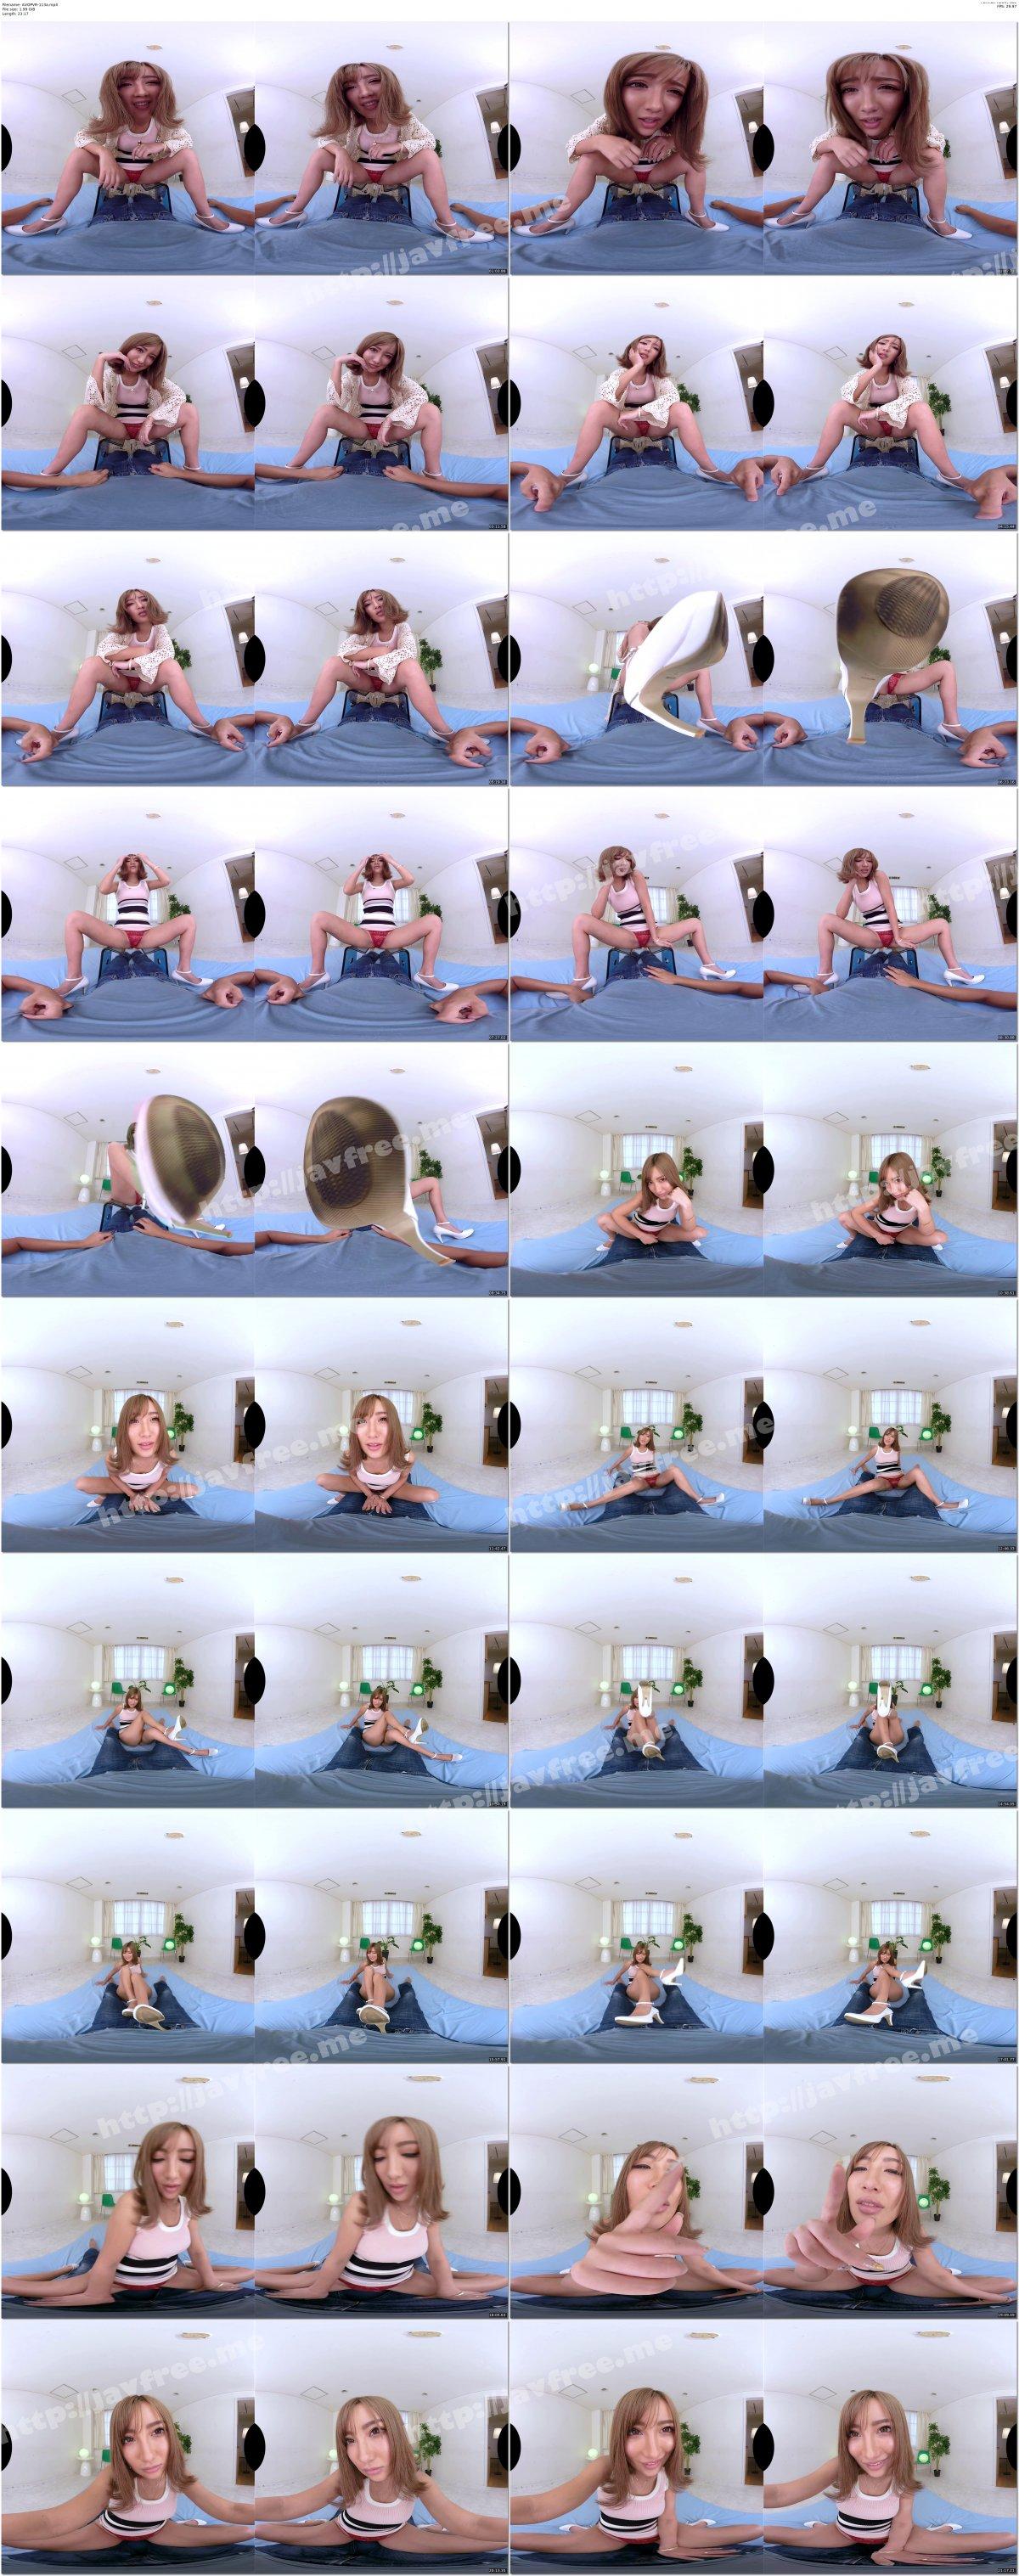 [AVOPVR-113] 【VR】鬼脚VR 罵倒×威圧×過激 攻めに責める過激3姉妹 AIKA 水川スミレ 星奈あい - image AVOPVR-113a on /